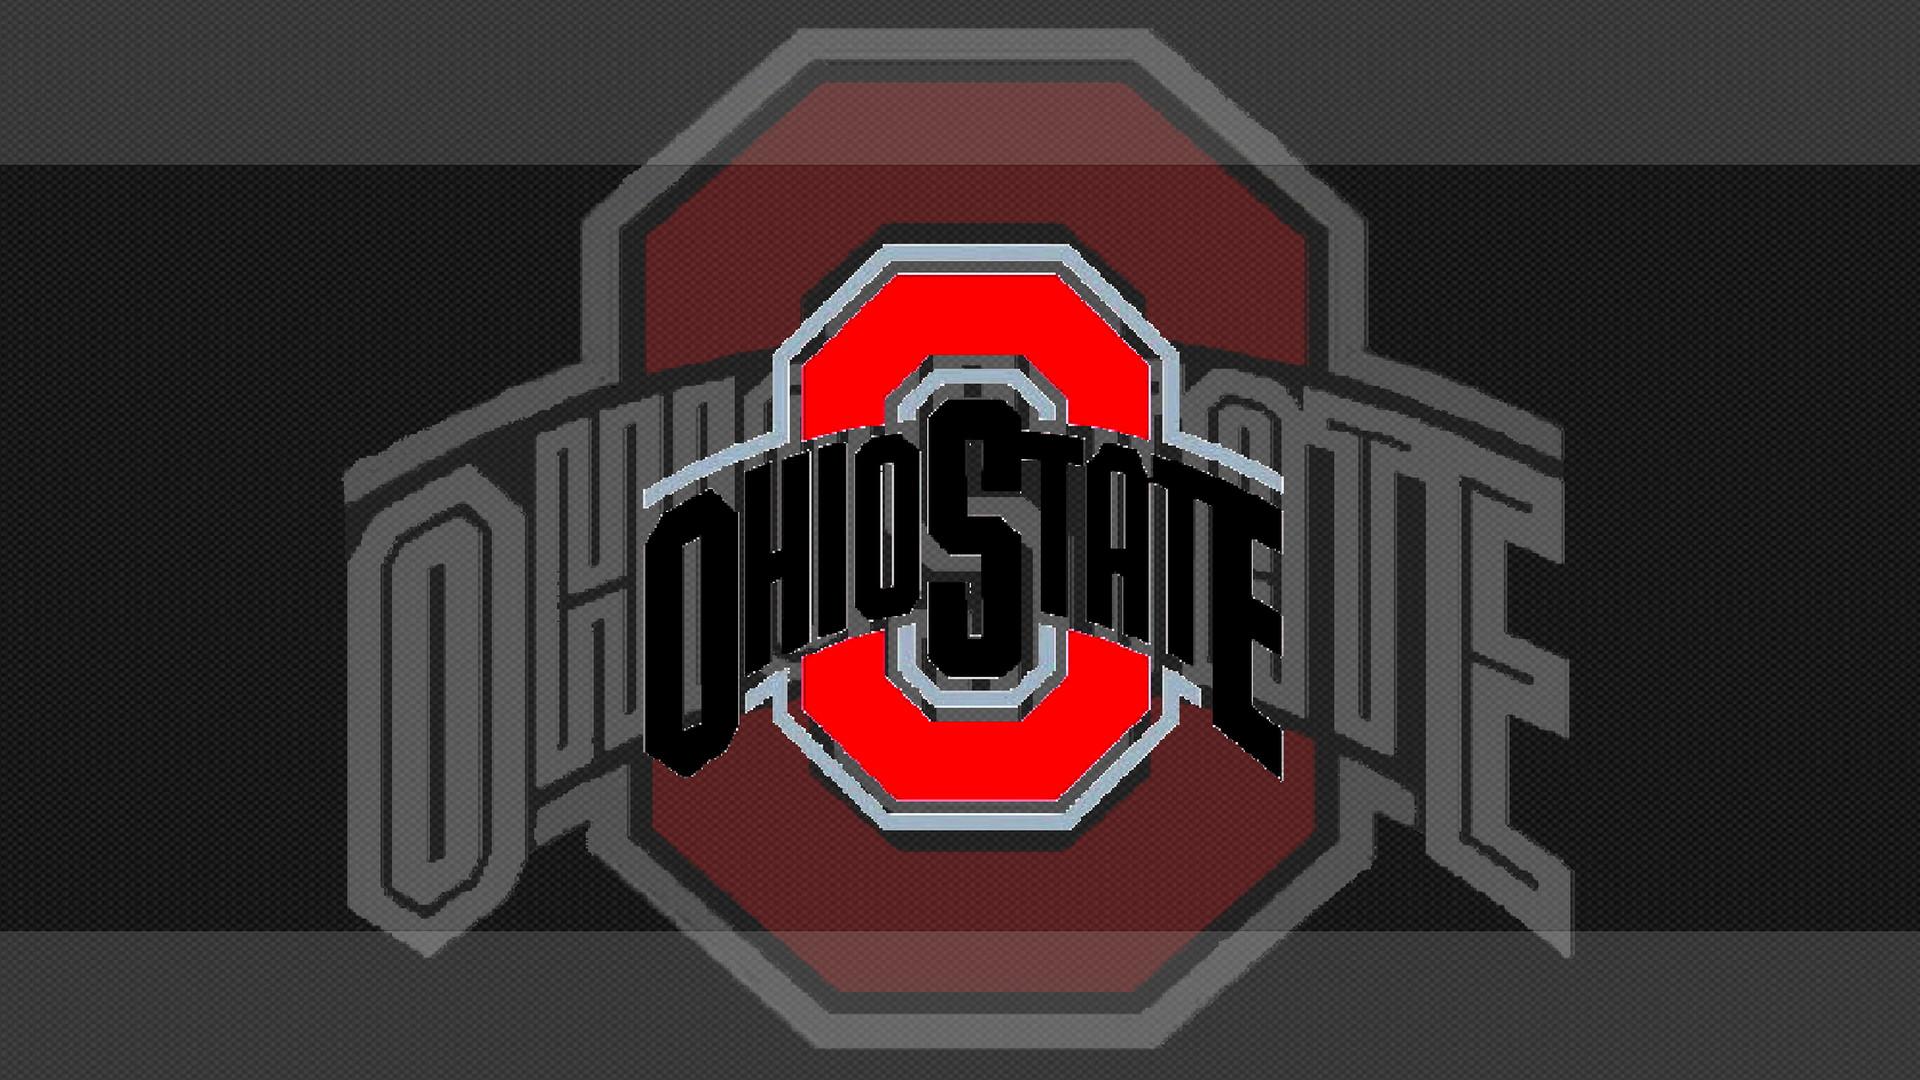 <b>Ohio State</b> Football <b>Wallpapers</